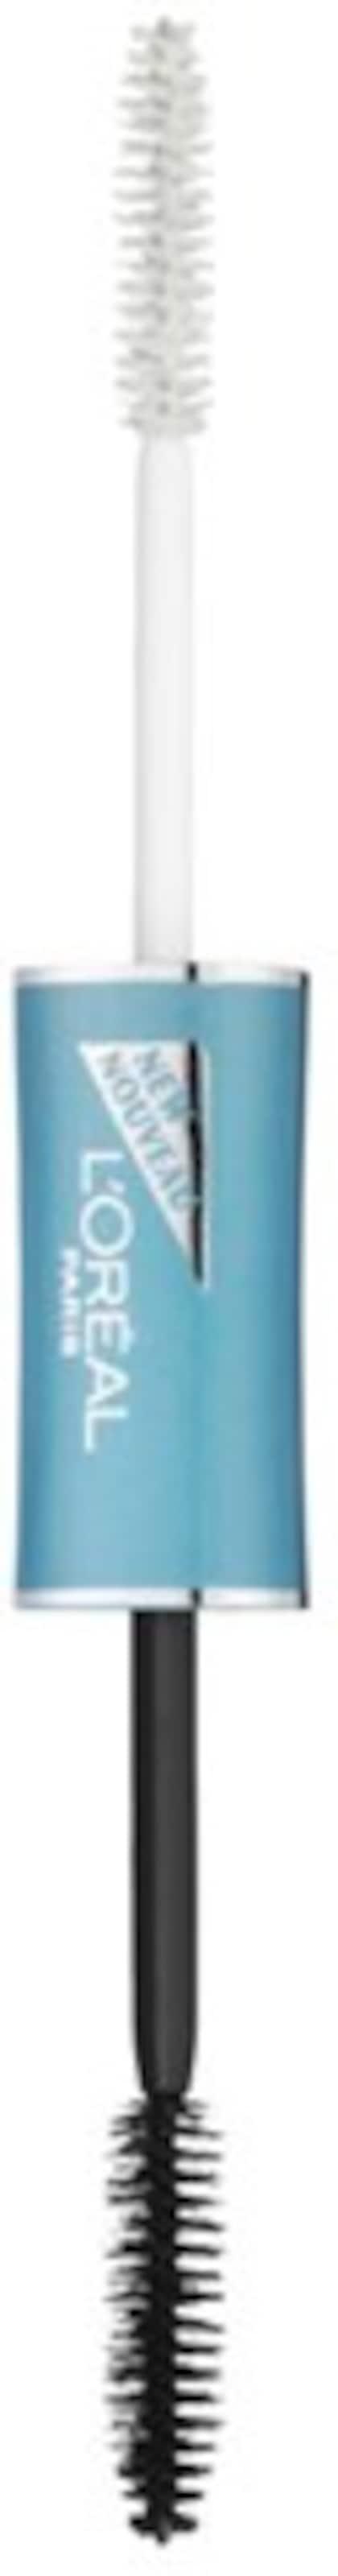 L'Oréal Paris 'Double Extension' Mascara Rabatt Bester Platz Niedriger Preis Günstiger Preis Verkauf Nicekicks Spielraum Shop Online-Verkauf wrWk3QfgD